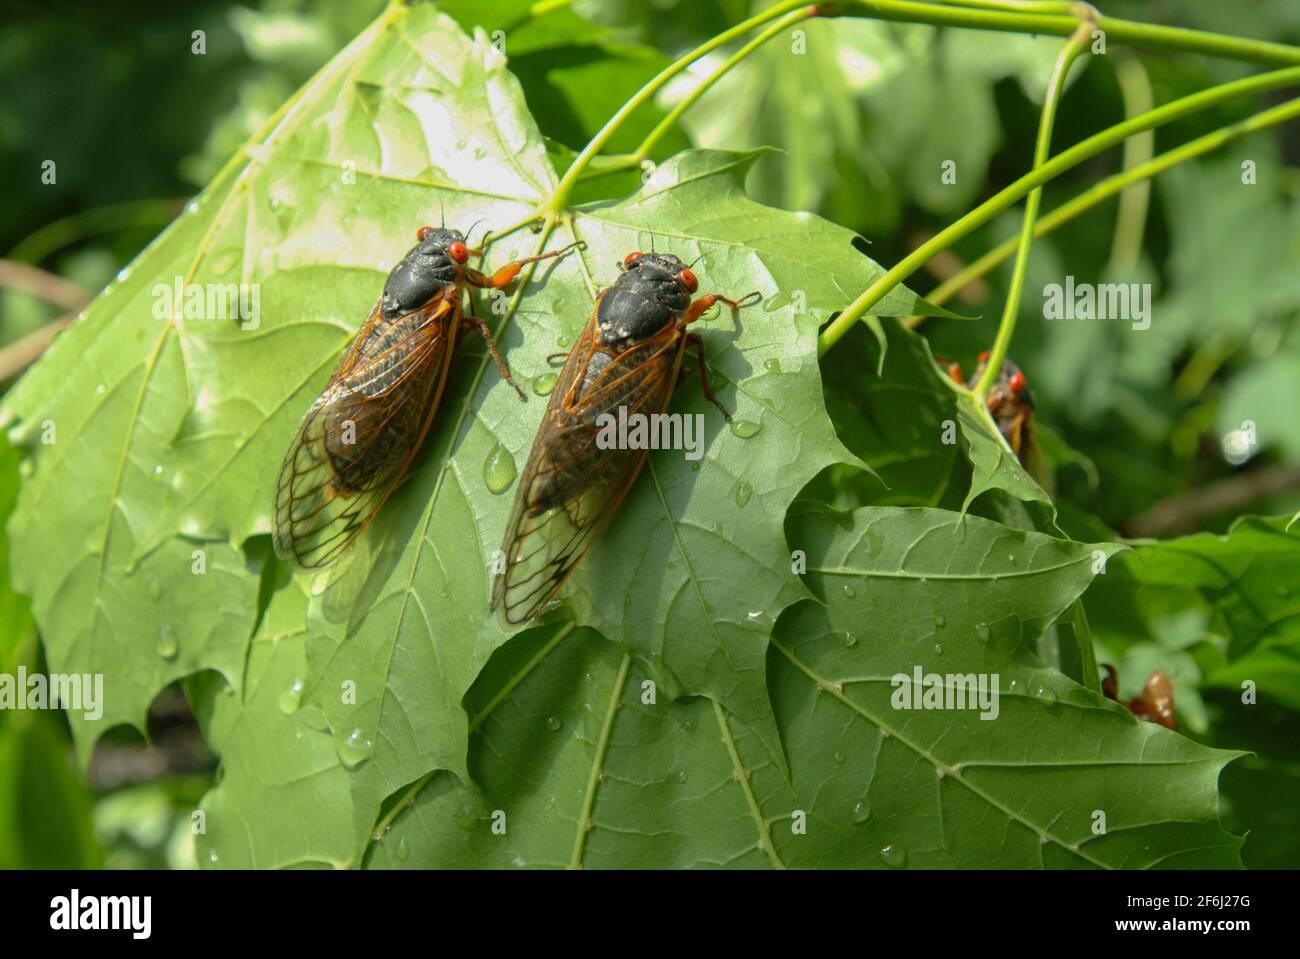 usa-maryland-insect-cicada-cicadas-cicadoidea-brood-x-17-year-cicada-emerges-from-the-ground-to-reproduce-2F6J27G.jpg